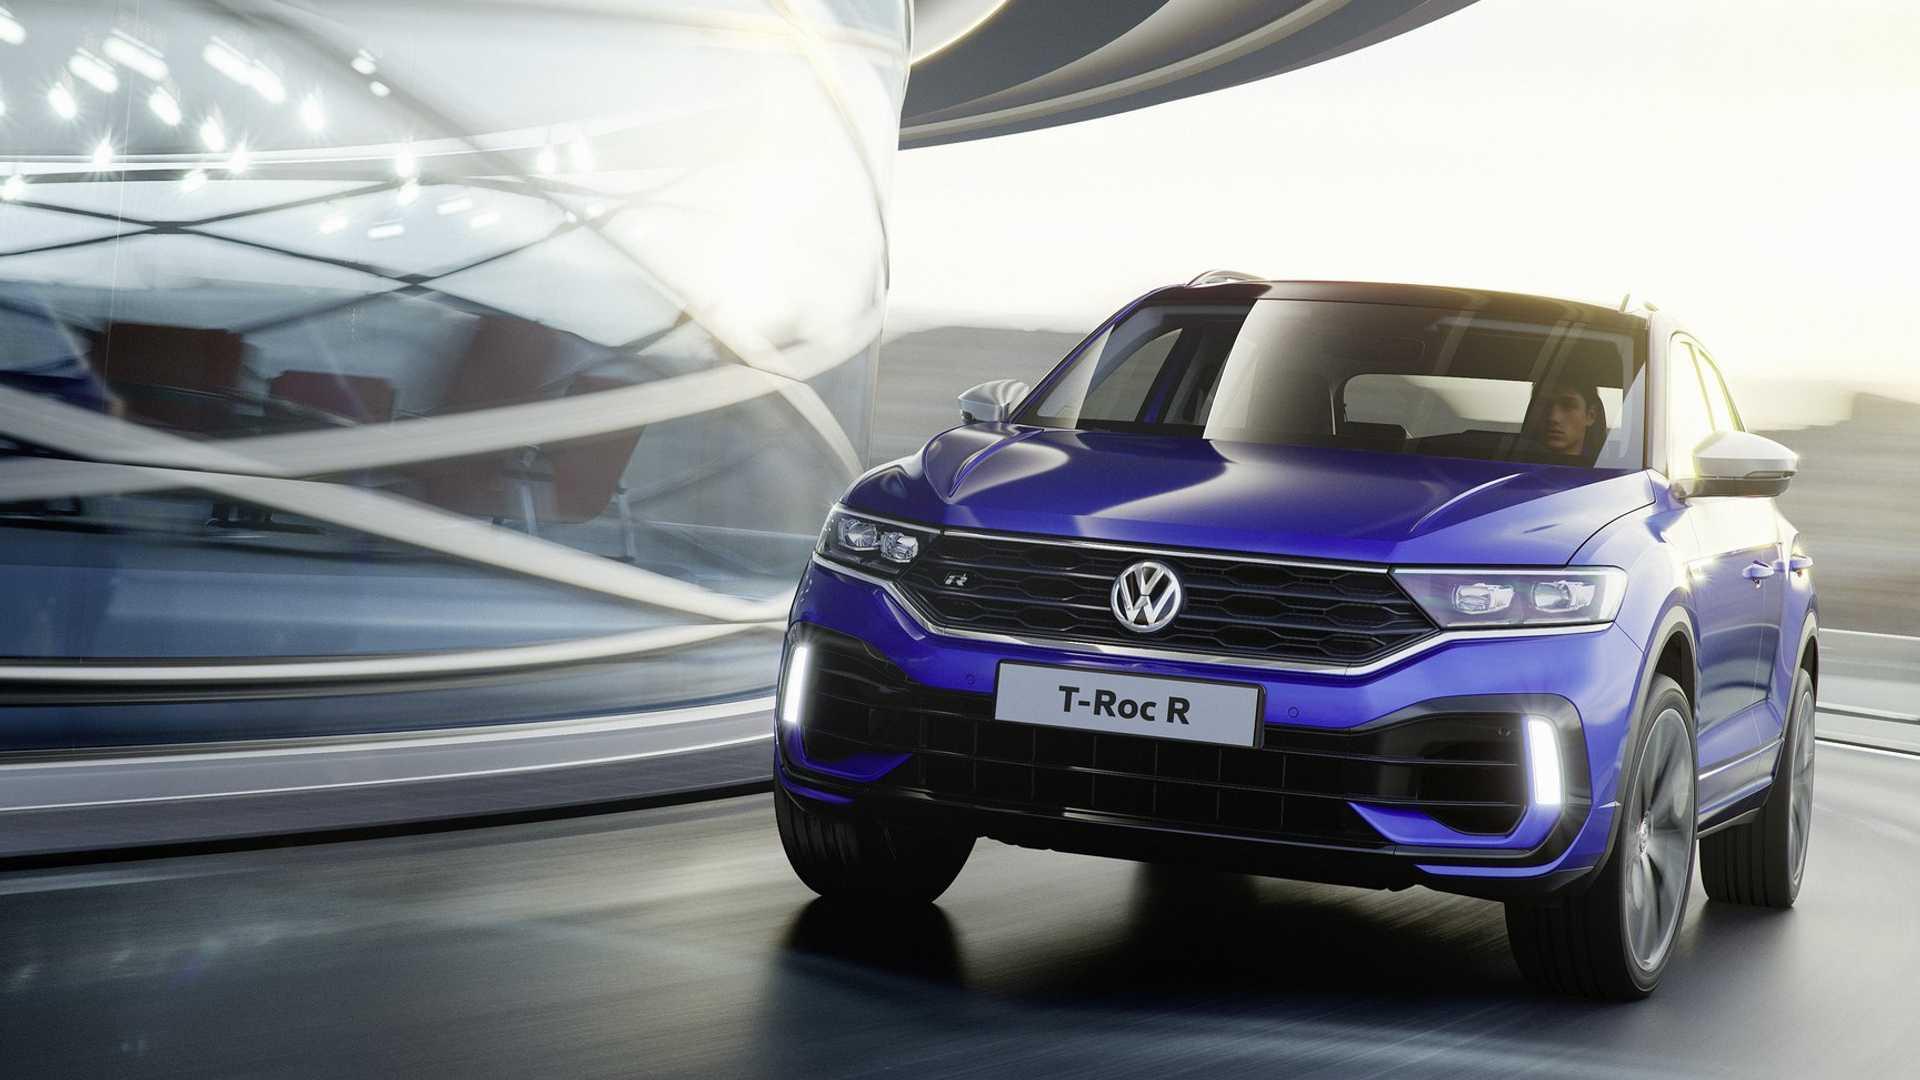 Stigao je Volkswagen T-Roc R (GALERIJA)